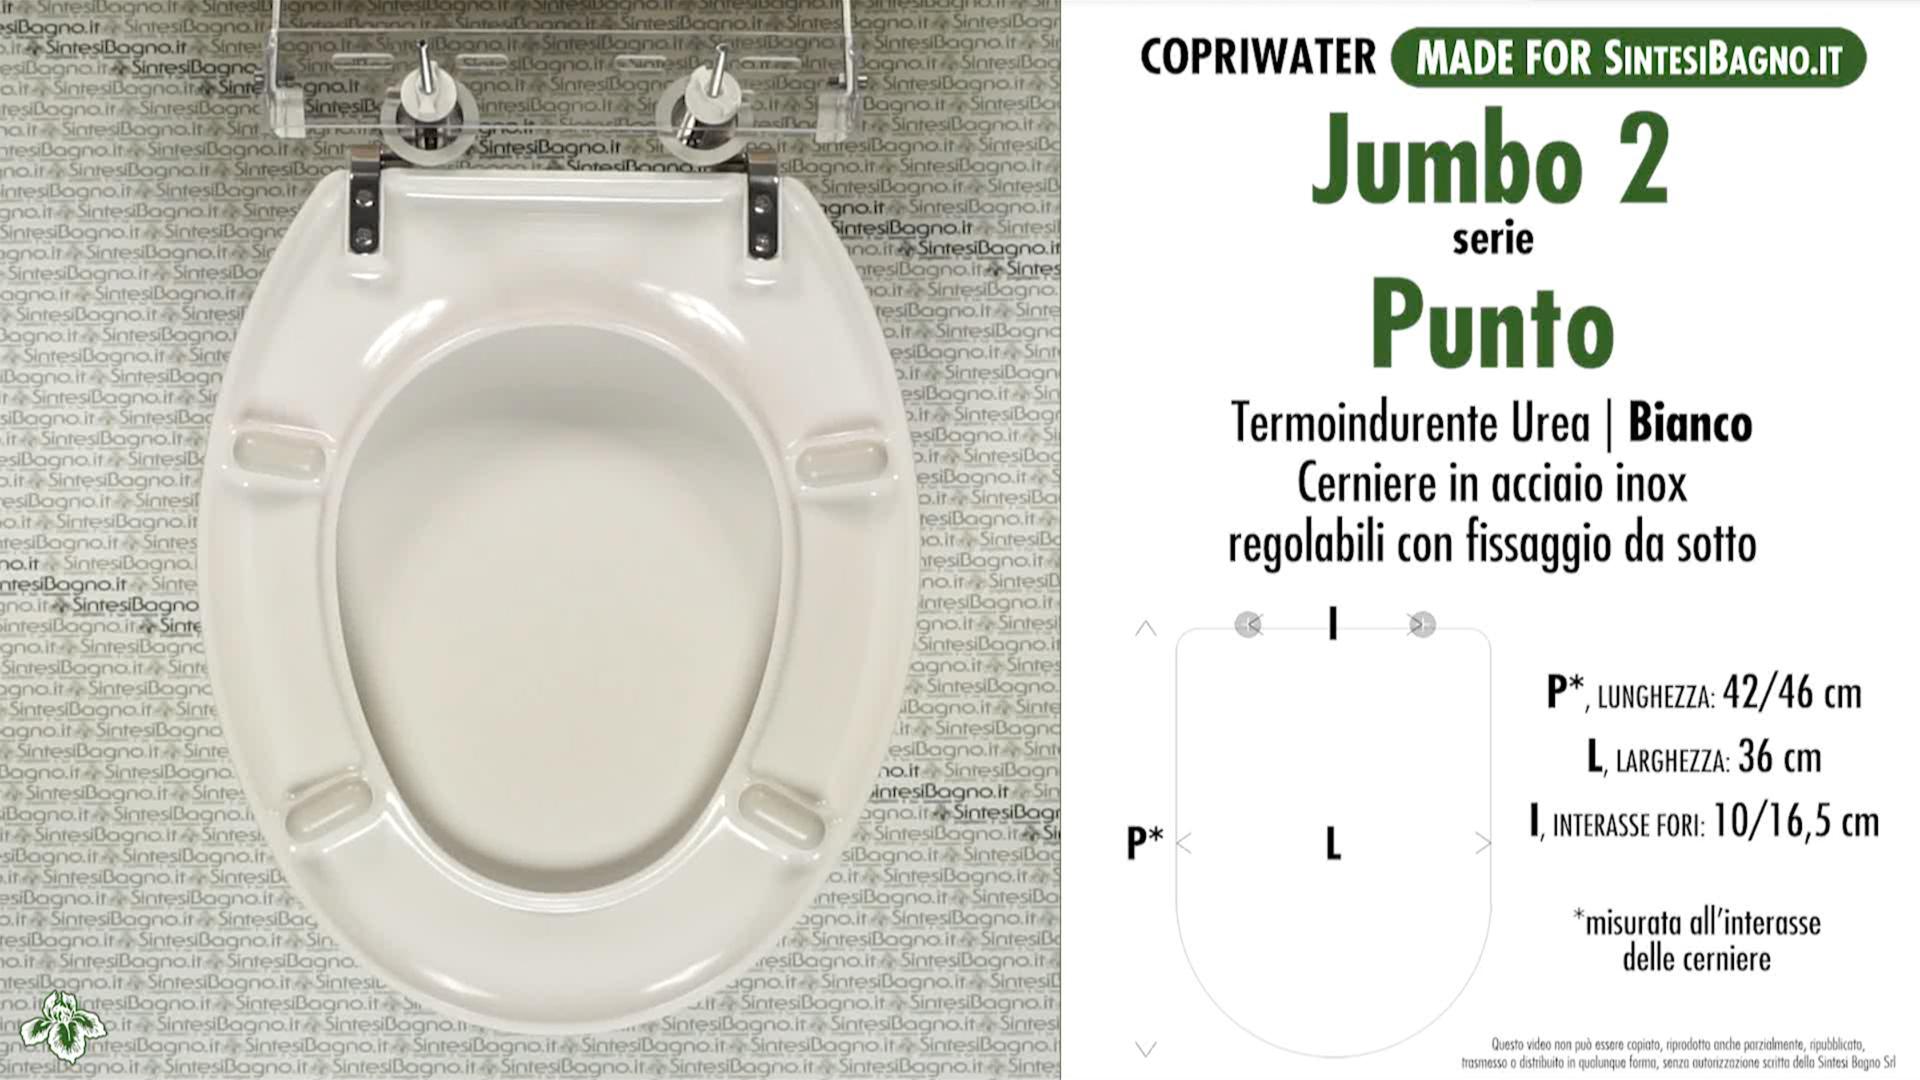 SCHEDA TECNICA MISURE copriwater JUMBO 2 PUNTO